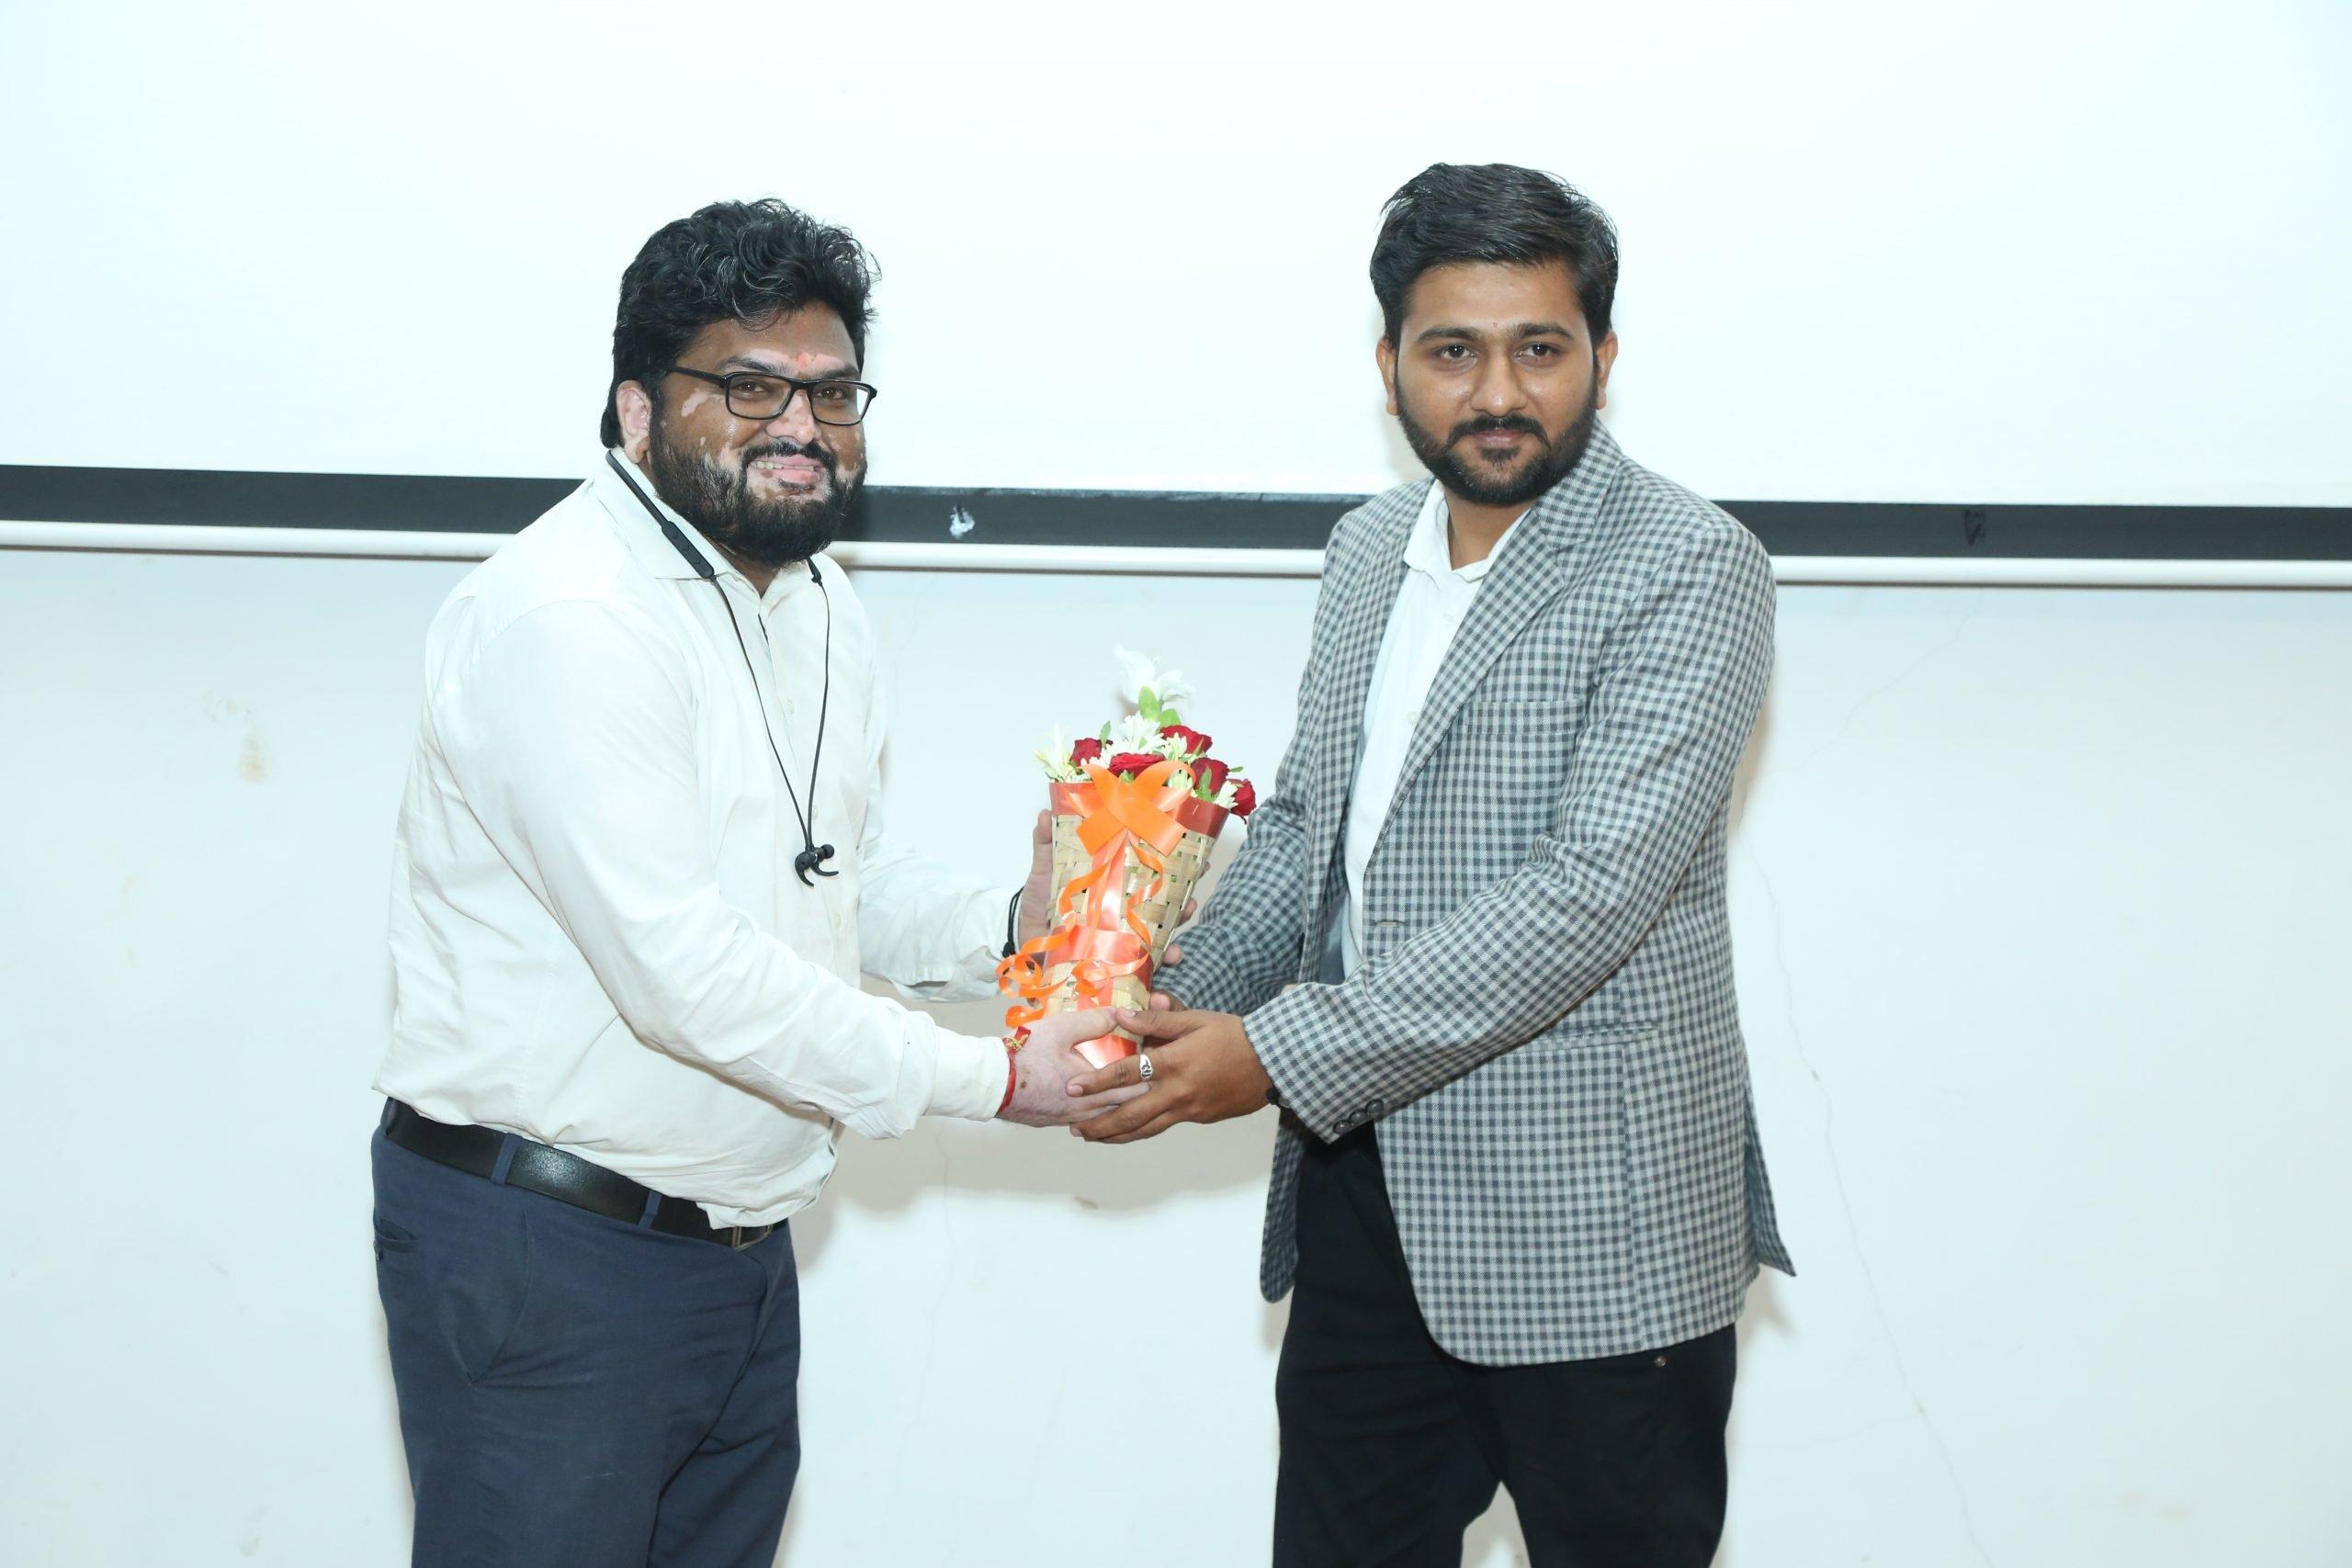 2019 Nasik IT association (NITA) - Startup - Business Development & Sales Course - Sandeep Sisodiya - Ahmedabad - Gujarat - India